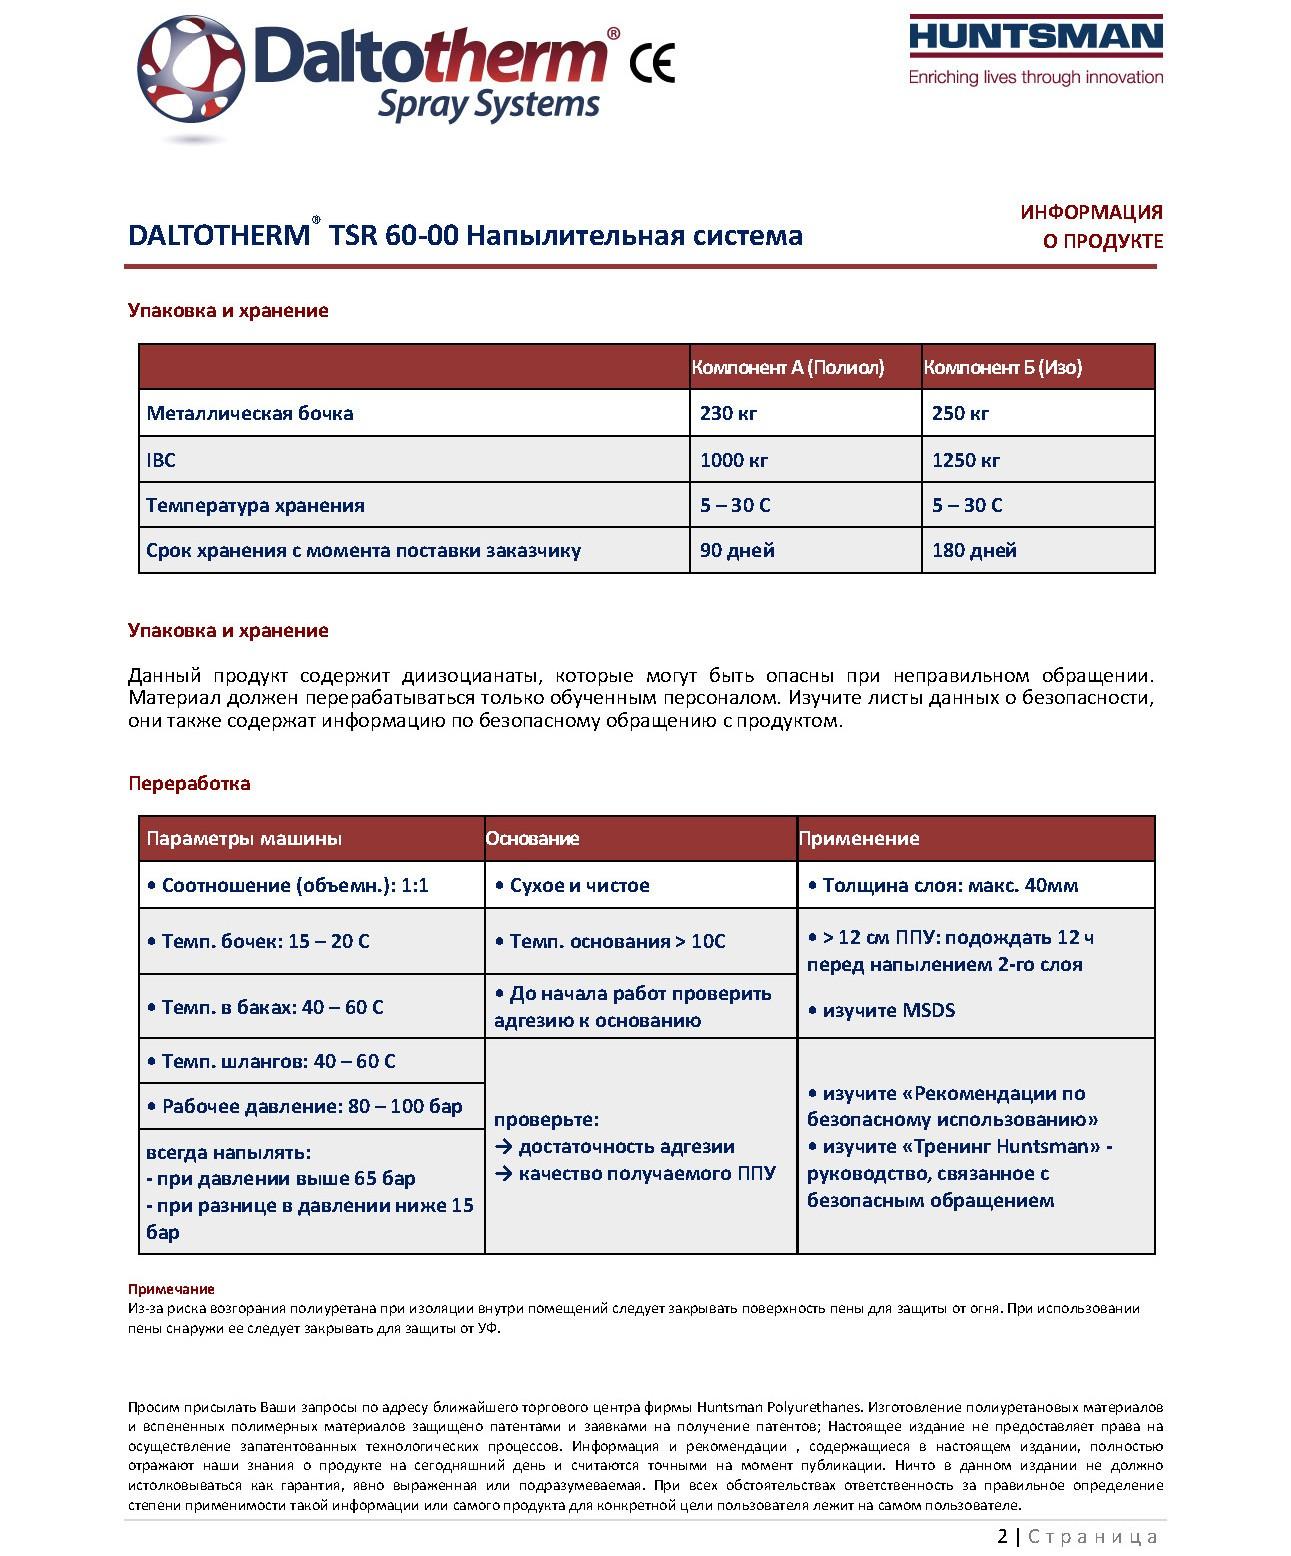 Daltotherm_TSR_60-00 компоненты Huntsman NMG Ханстман _Страница_2